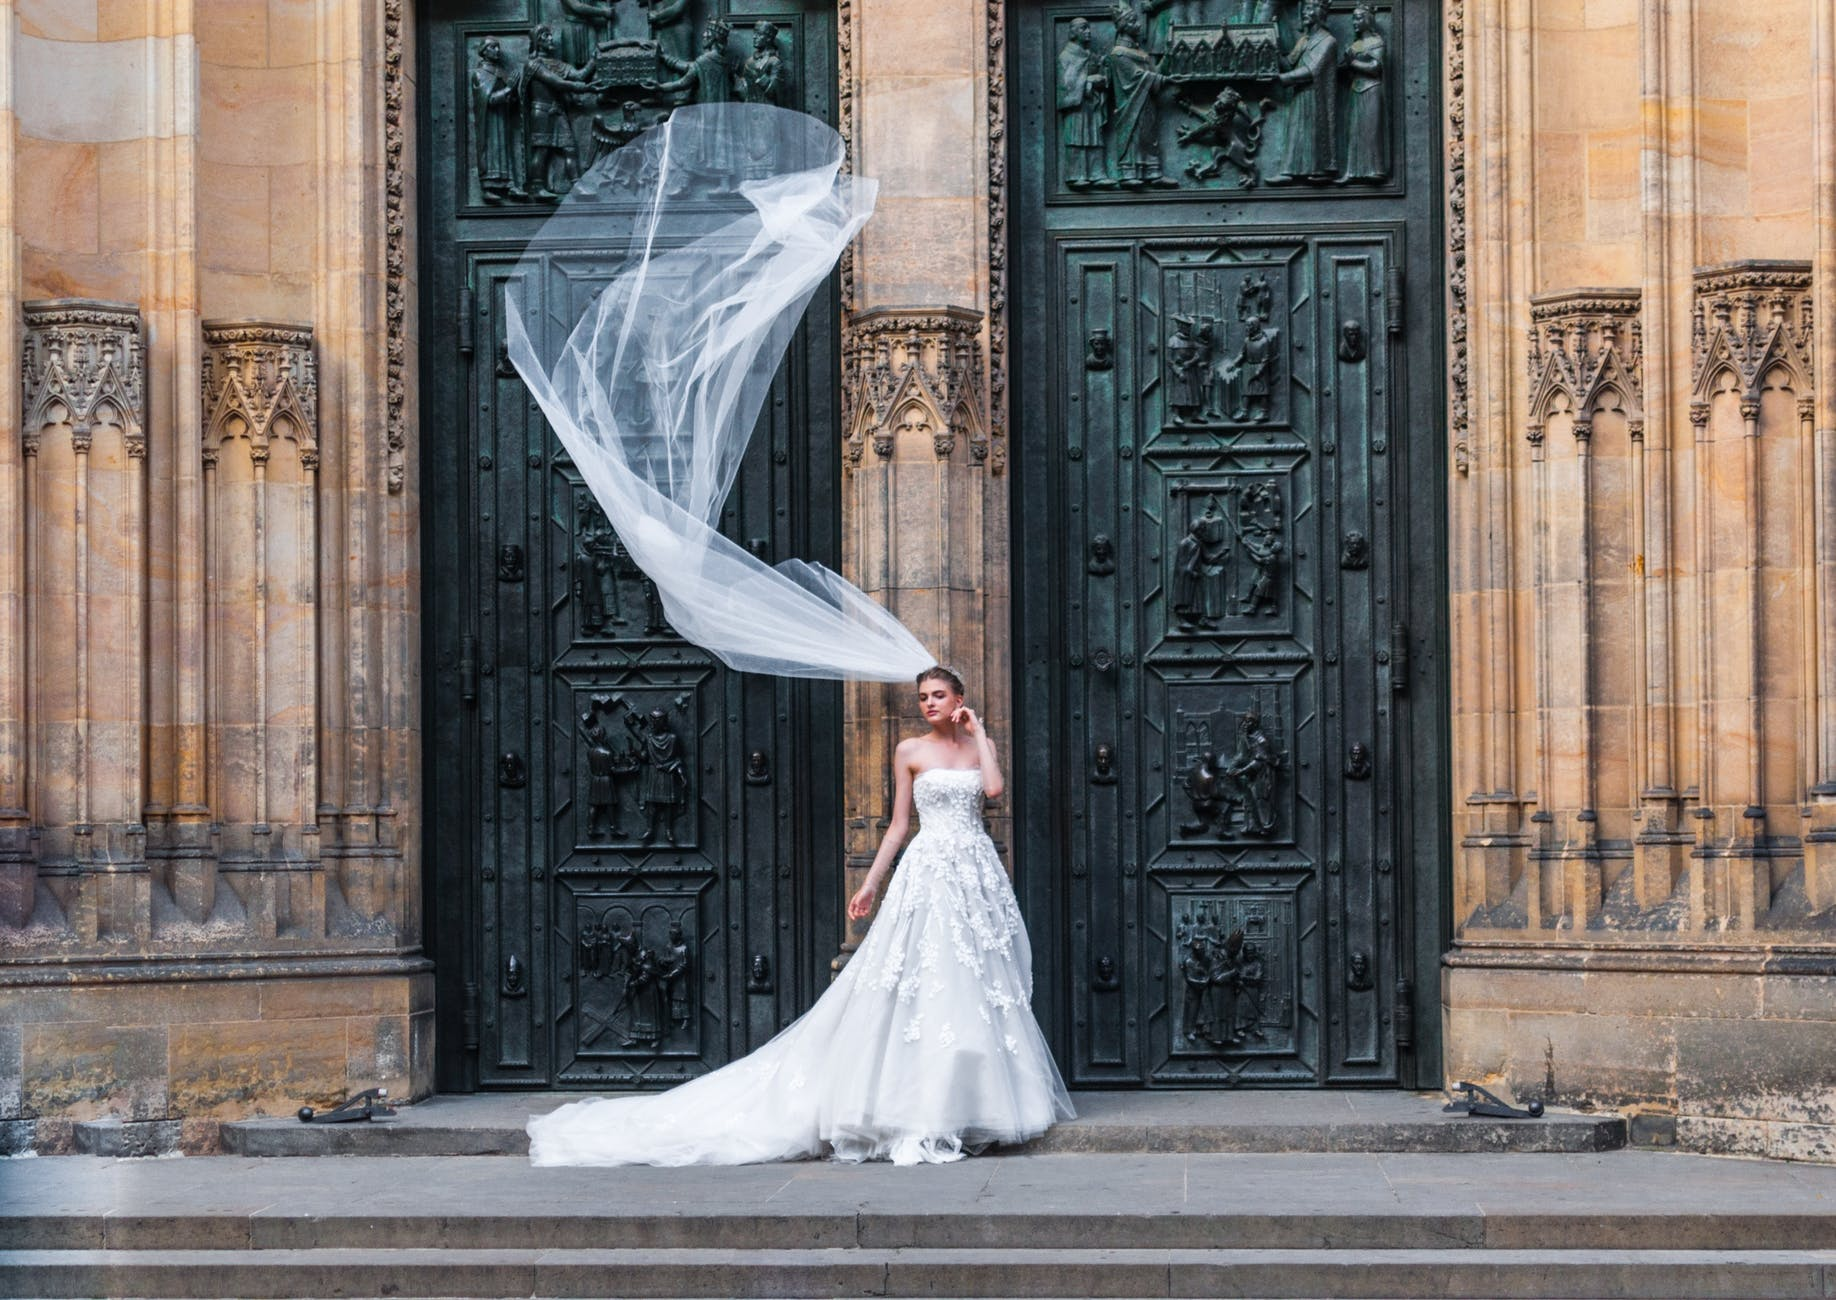 Cum iti ingrijesti rochia de mireasa inainte, in ziua si dupa nunta